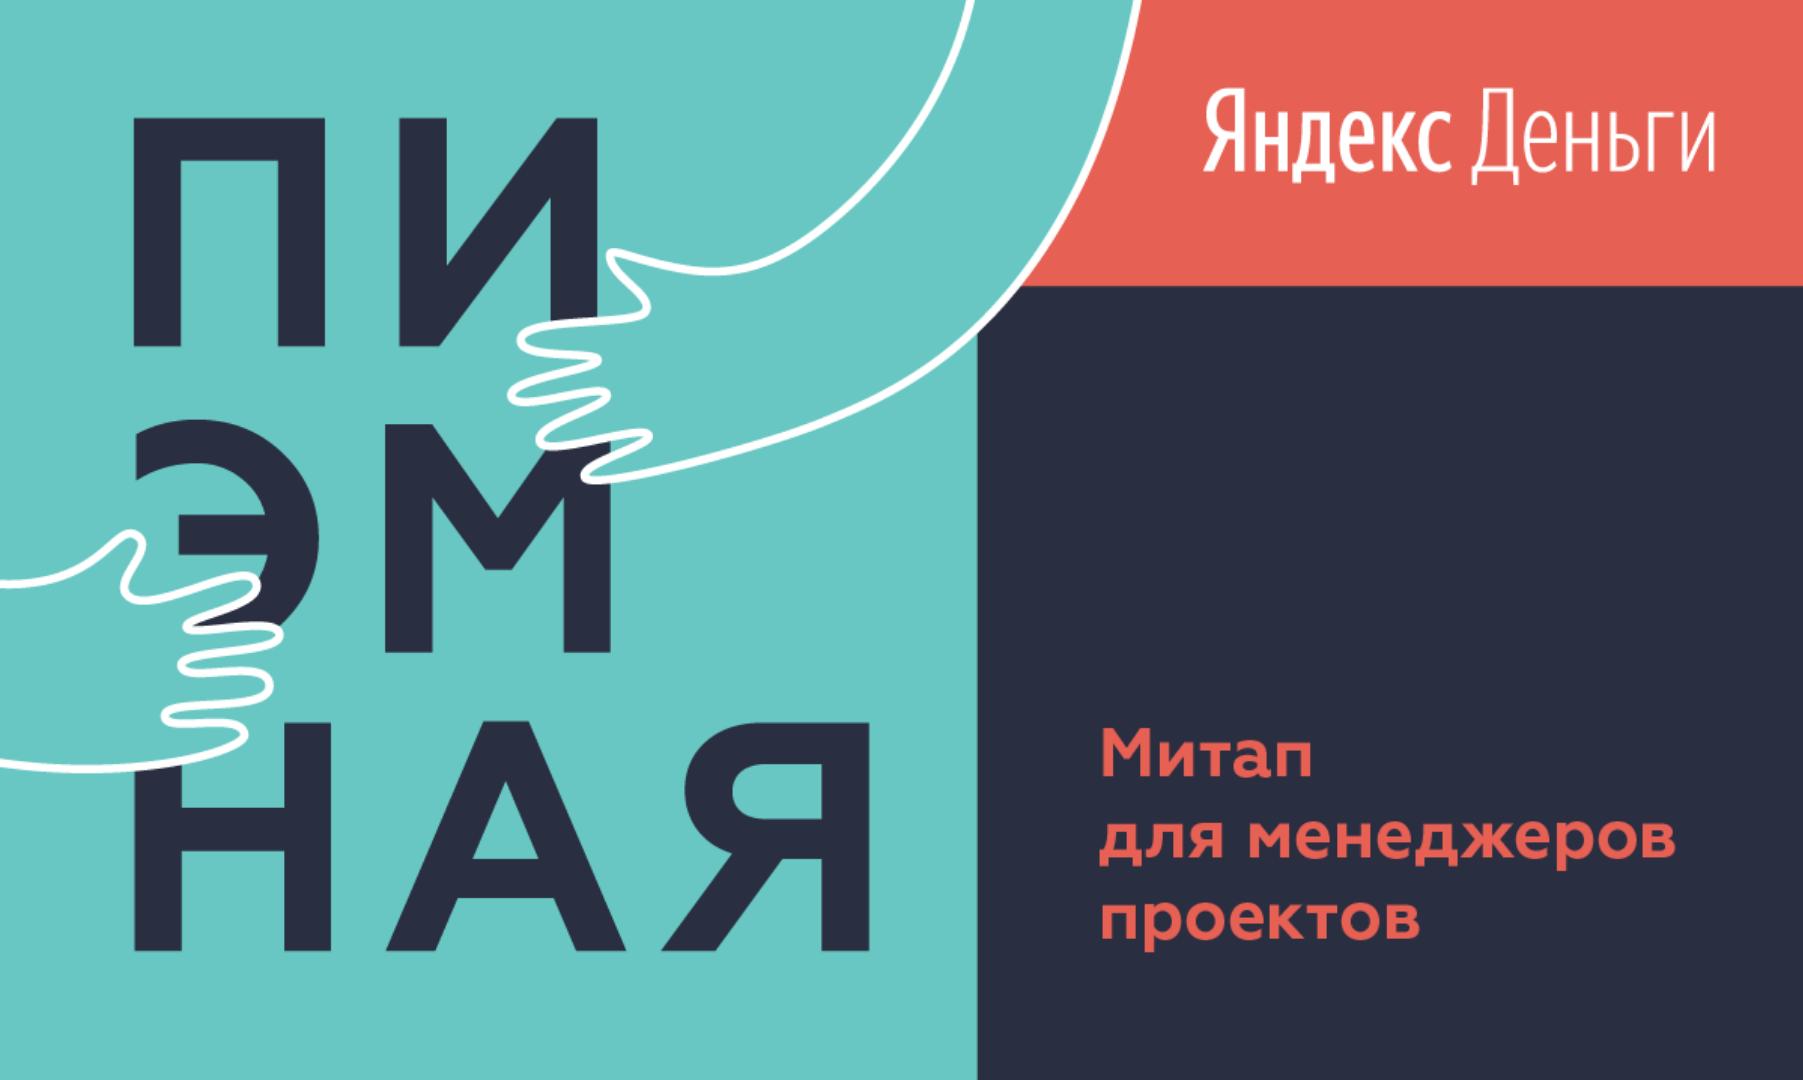 Драйвим разработчиков и даём фидбек по-научному — видео с митапа Яндекс.Денег - 1